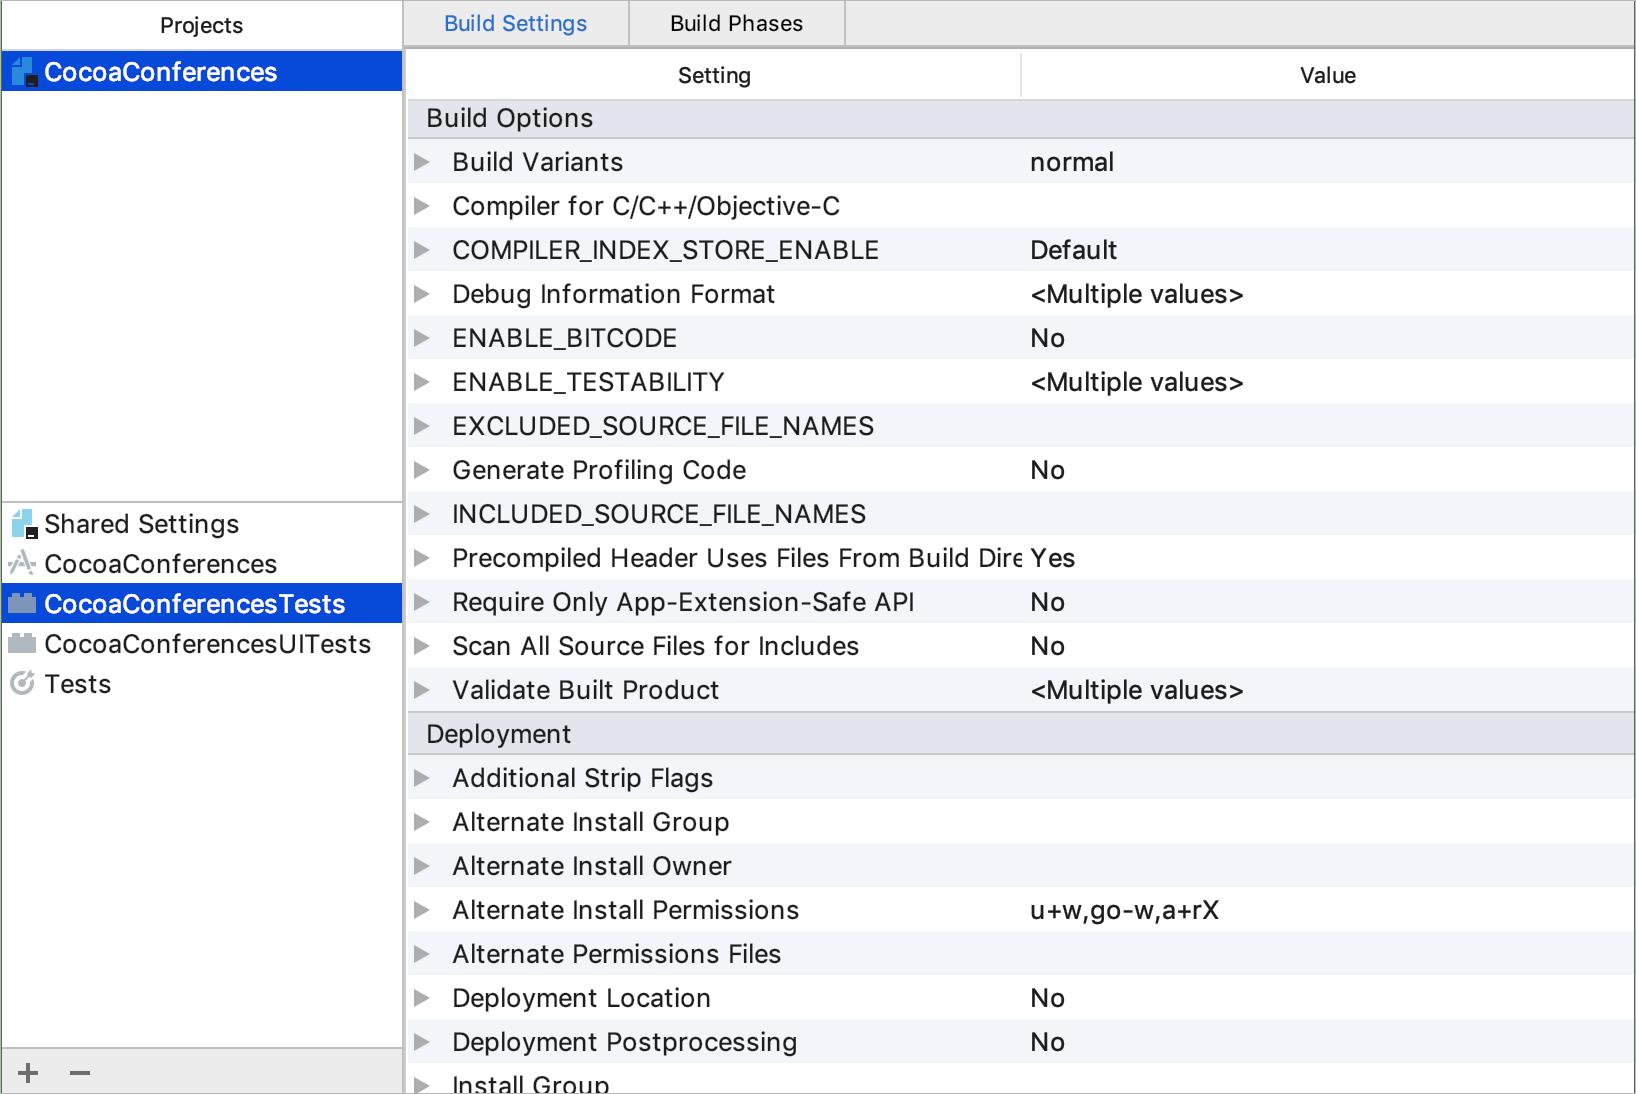 Xcode-compatible settings